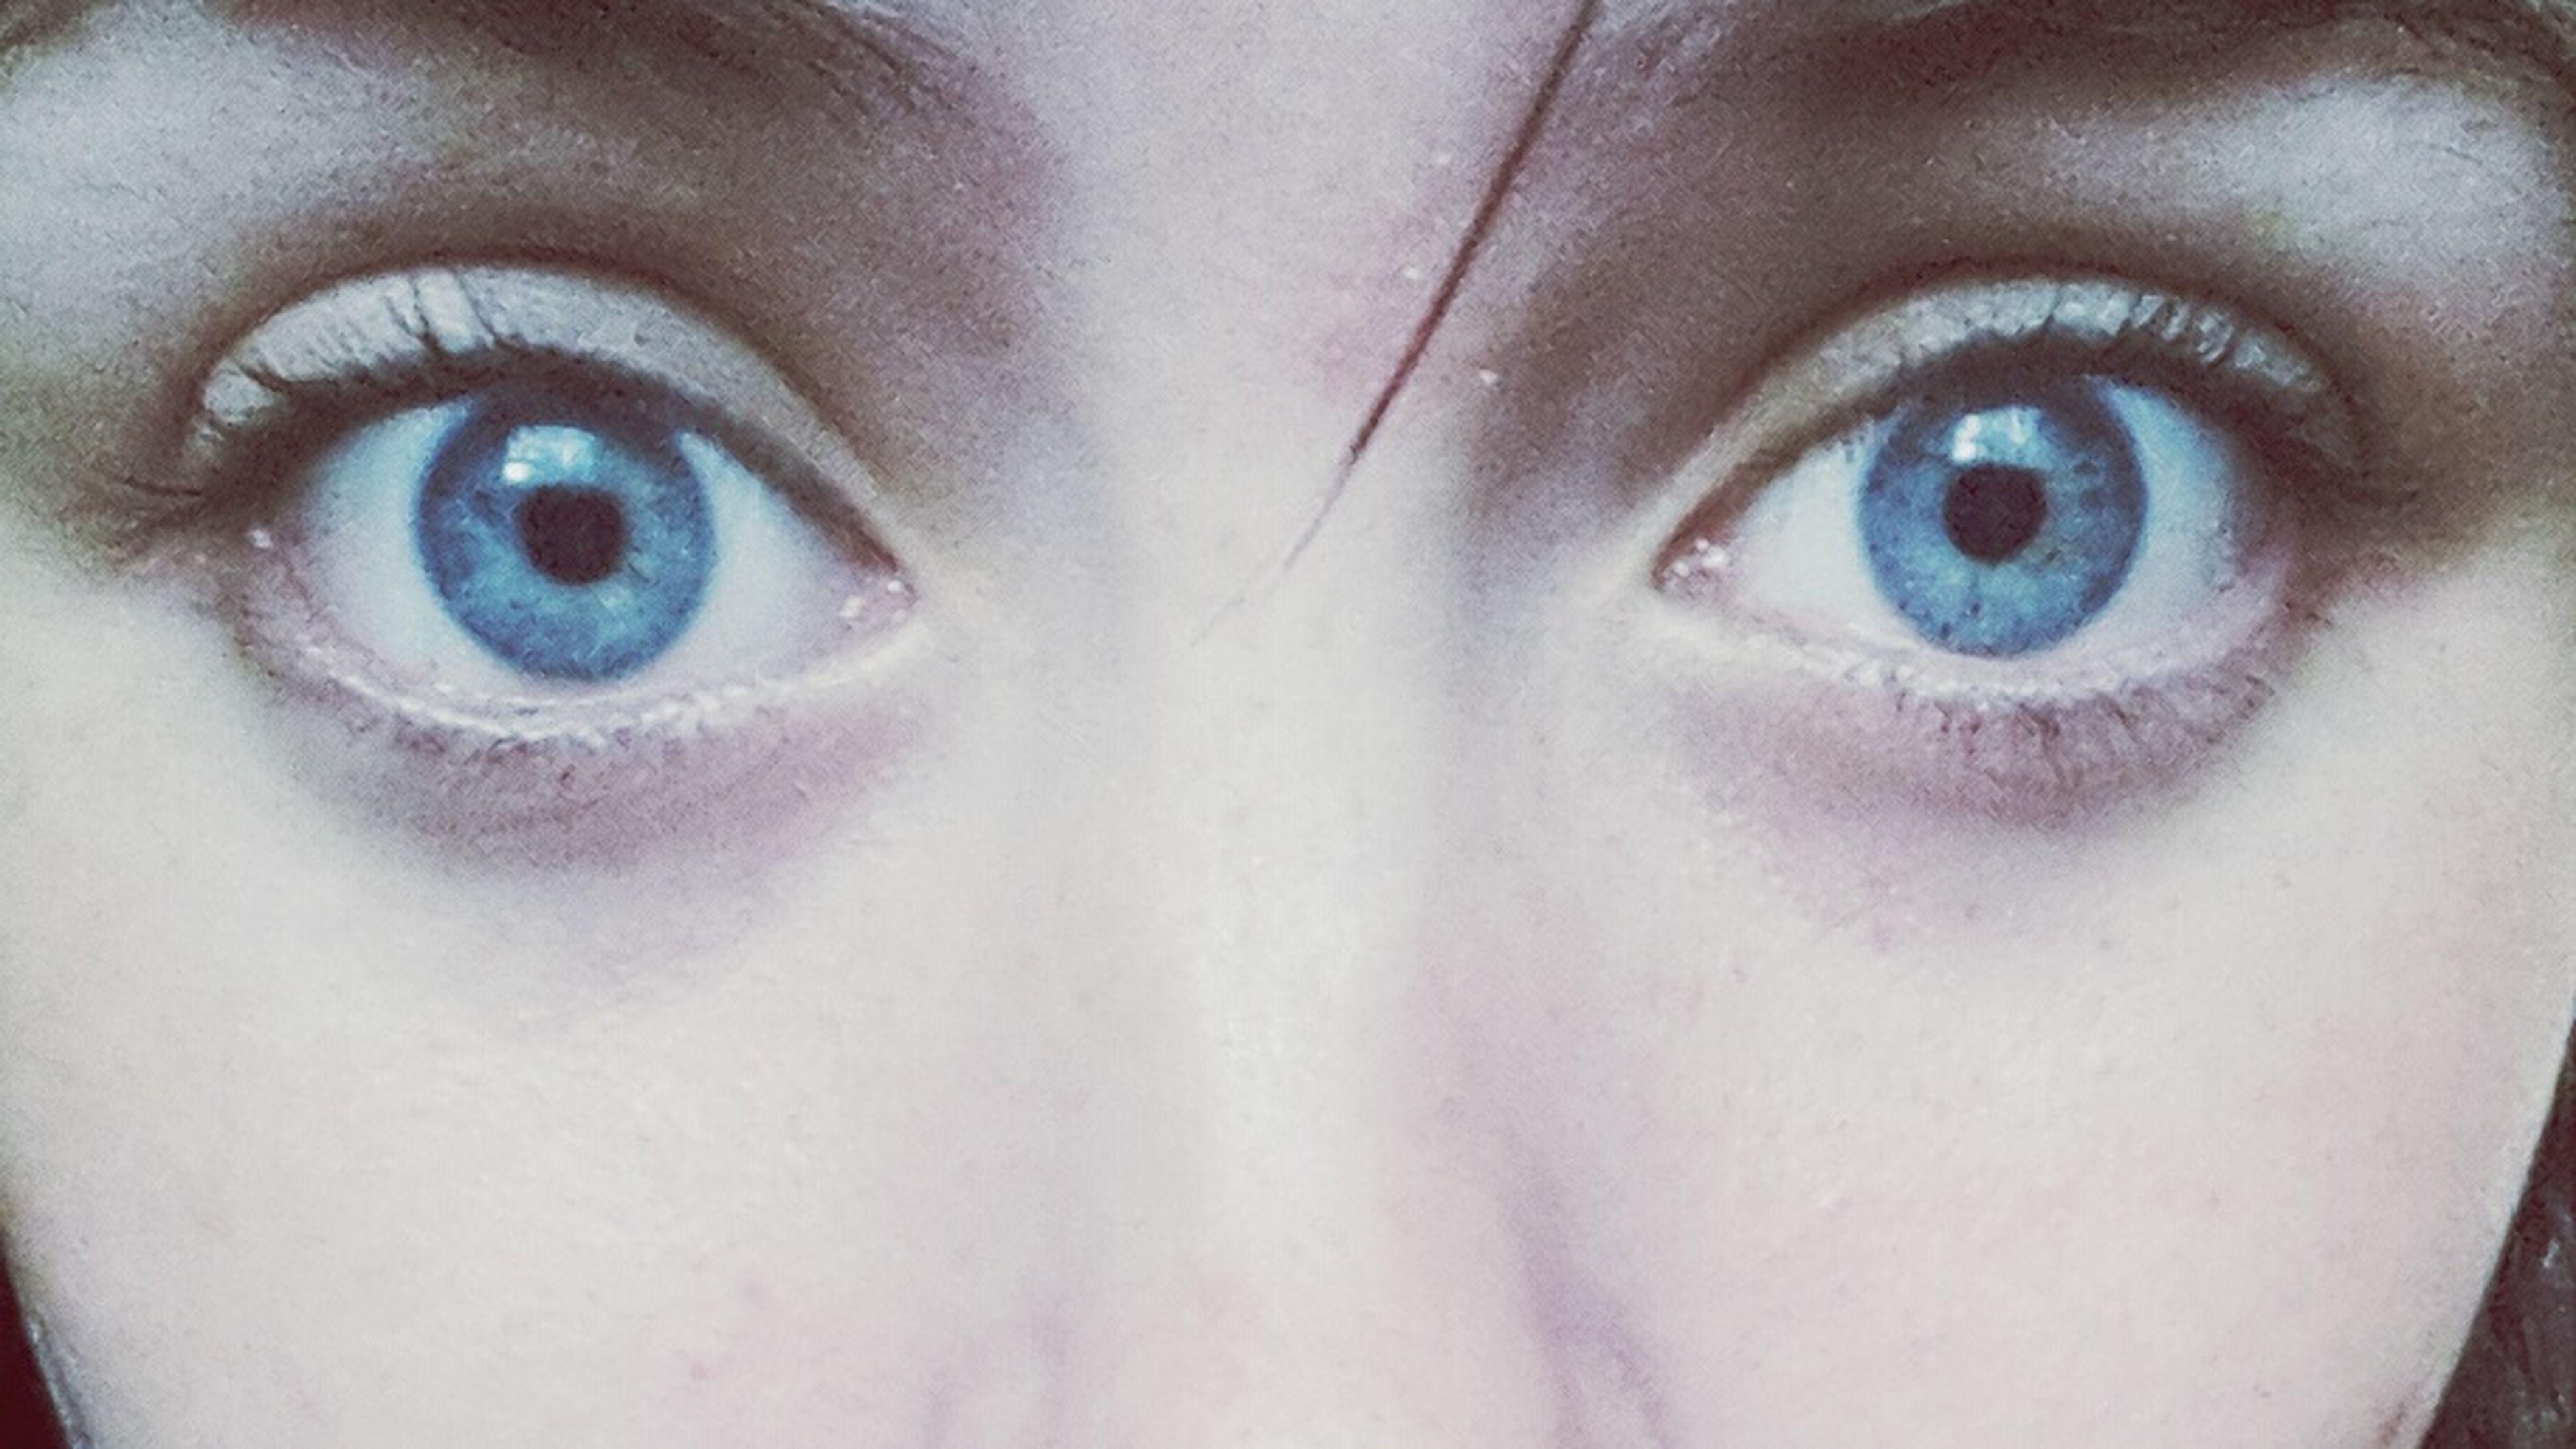 looking at camera, portrait, human eye, close-up, human face, headshot, indoors, eyelash, part of, eyesight, lifestyles, extreme close-up, full frame, blue eyes, front view, human skin, sensory perception